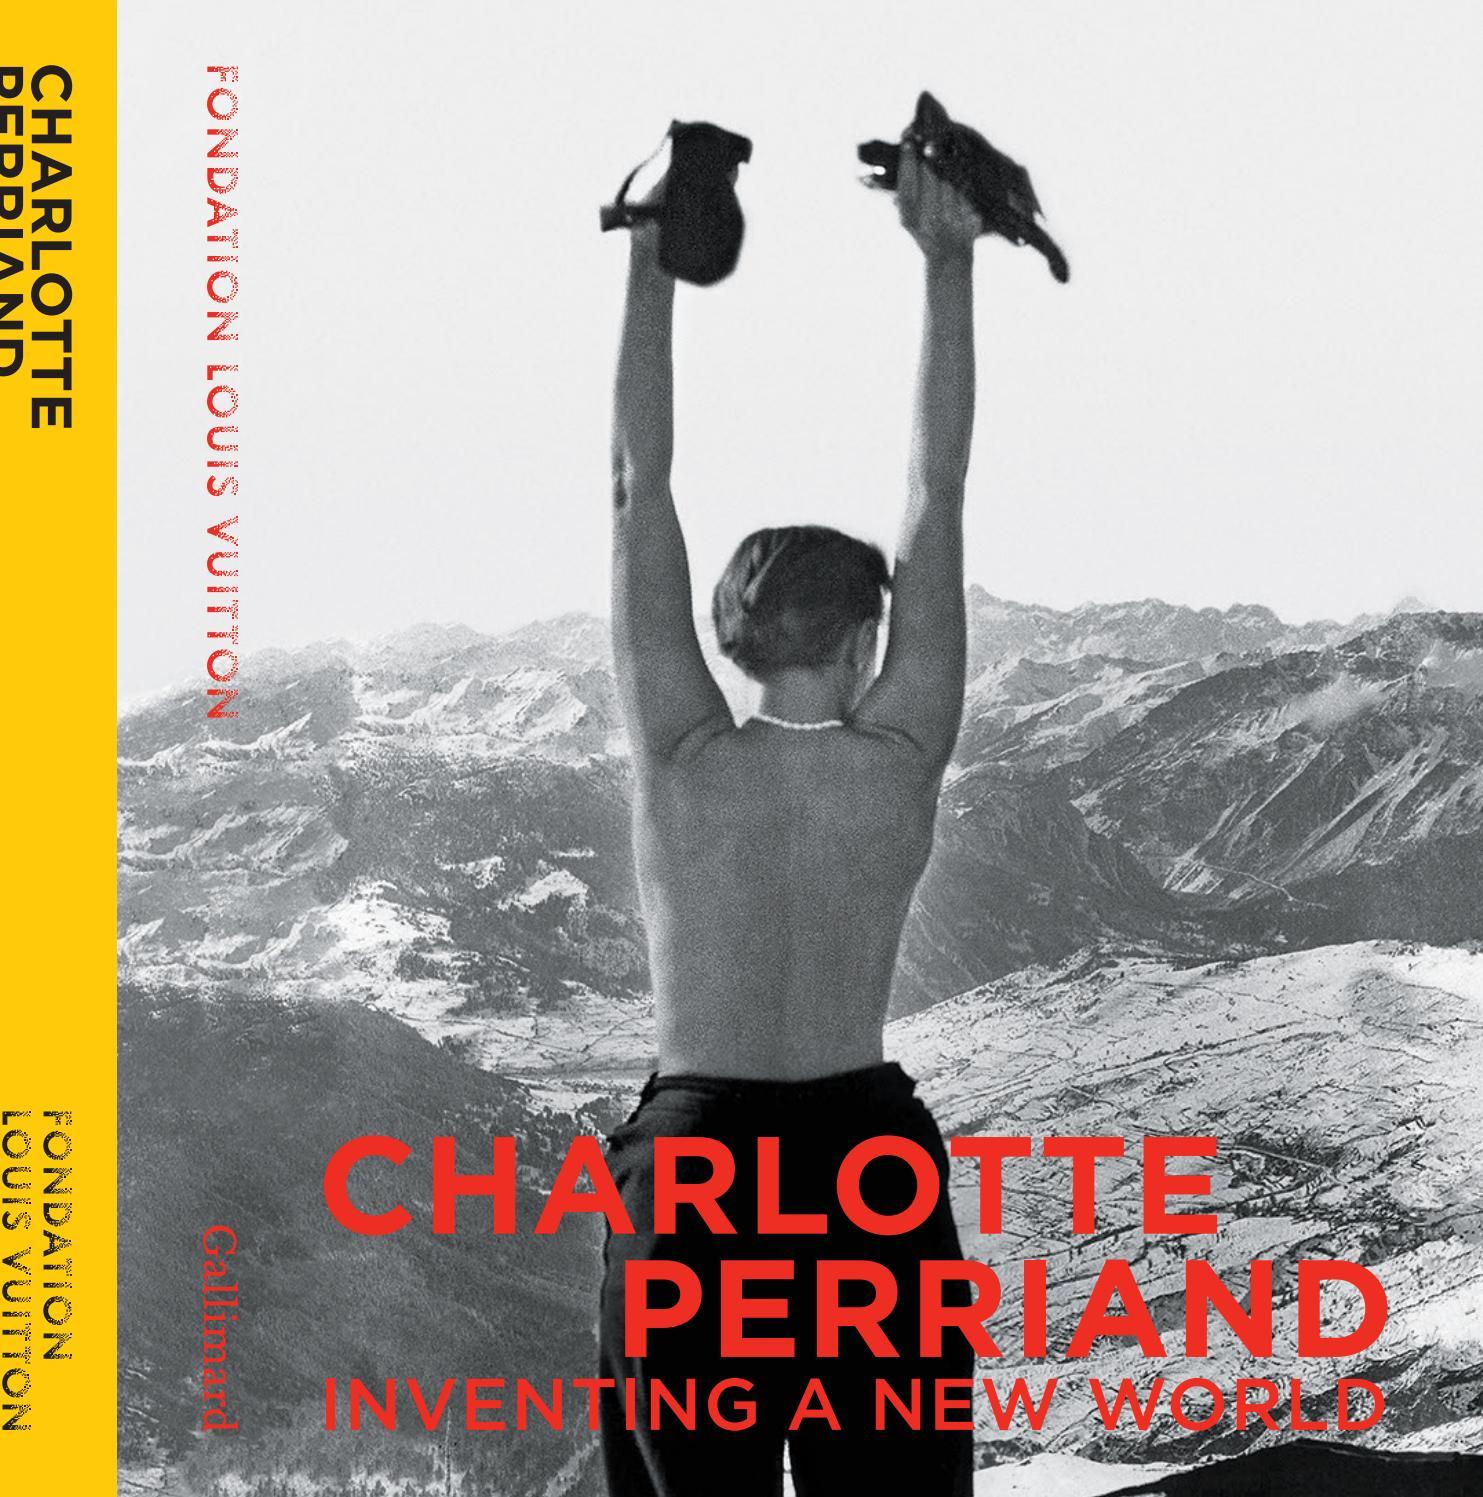 Esprit Wave Draaifauteuil.Charlotte Perriand By Acc Art Books Issuu